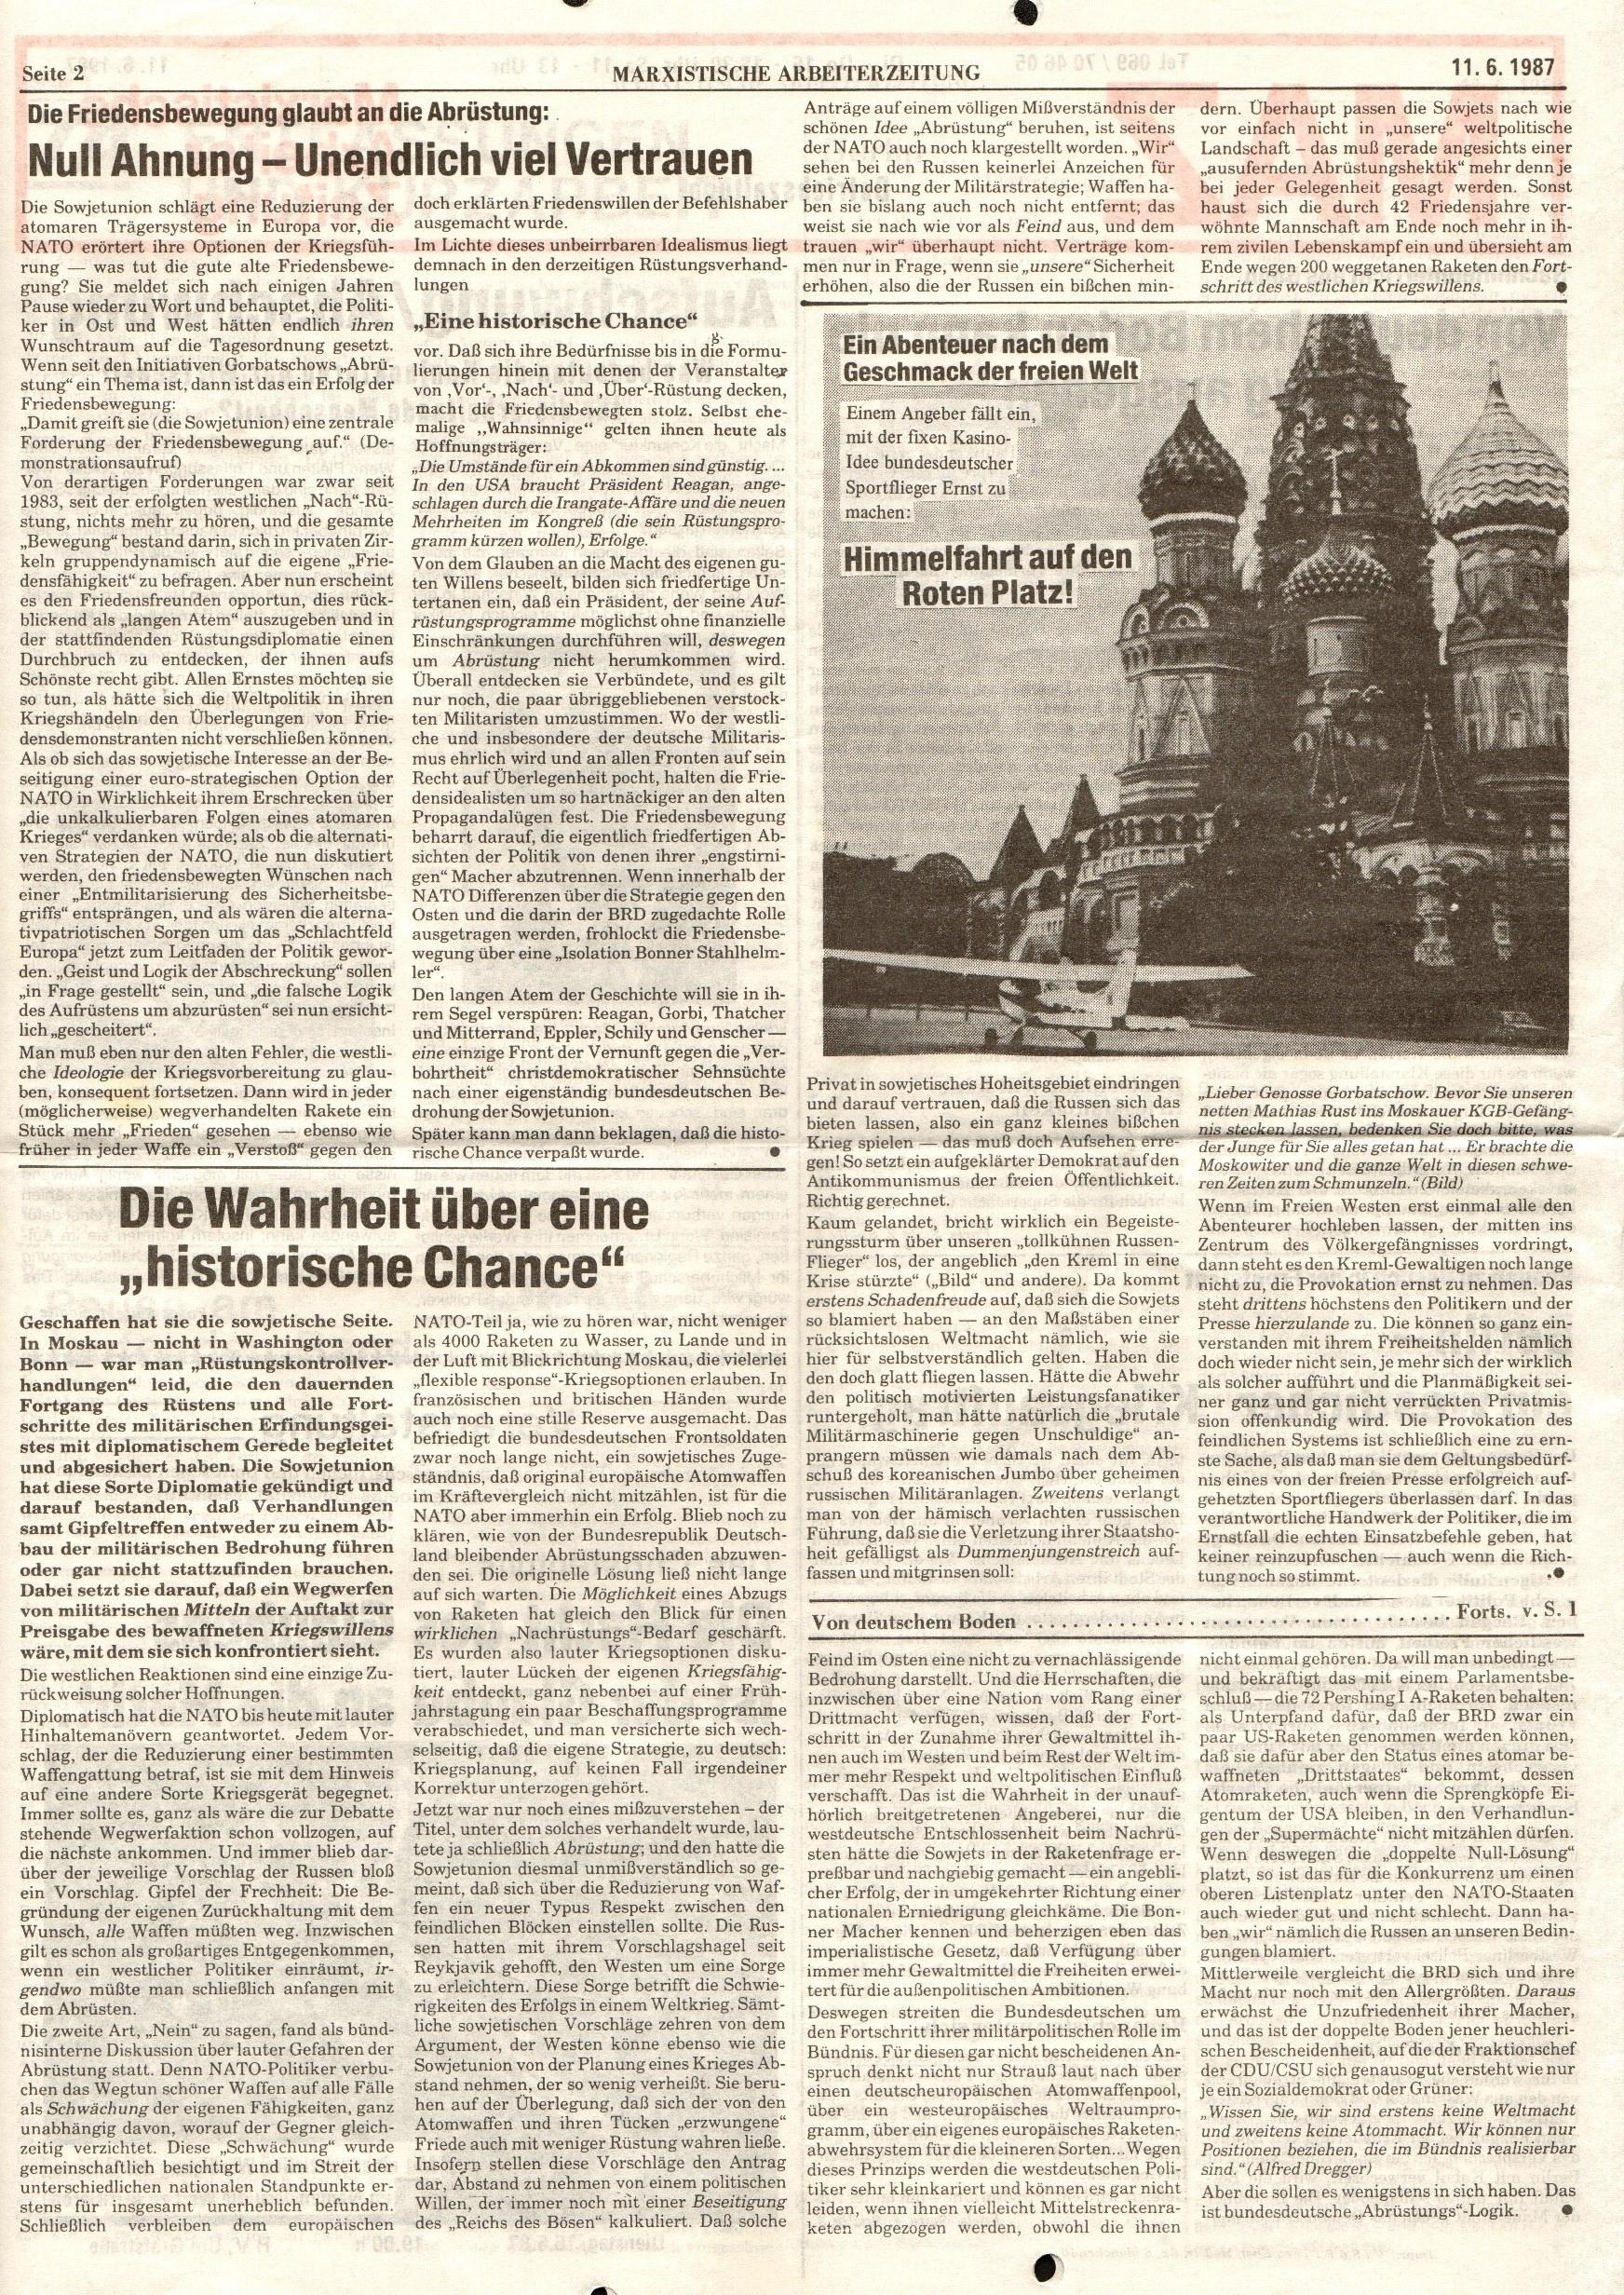 Frankfurt_CPK_Hoechst_MAZ450